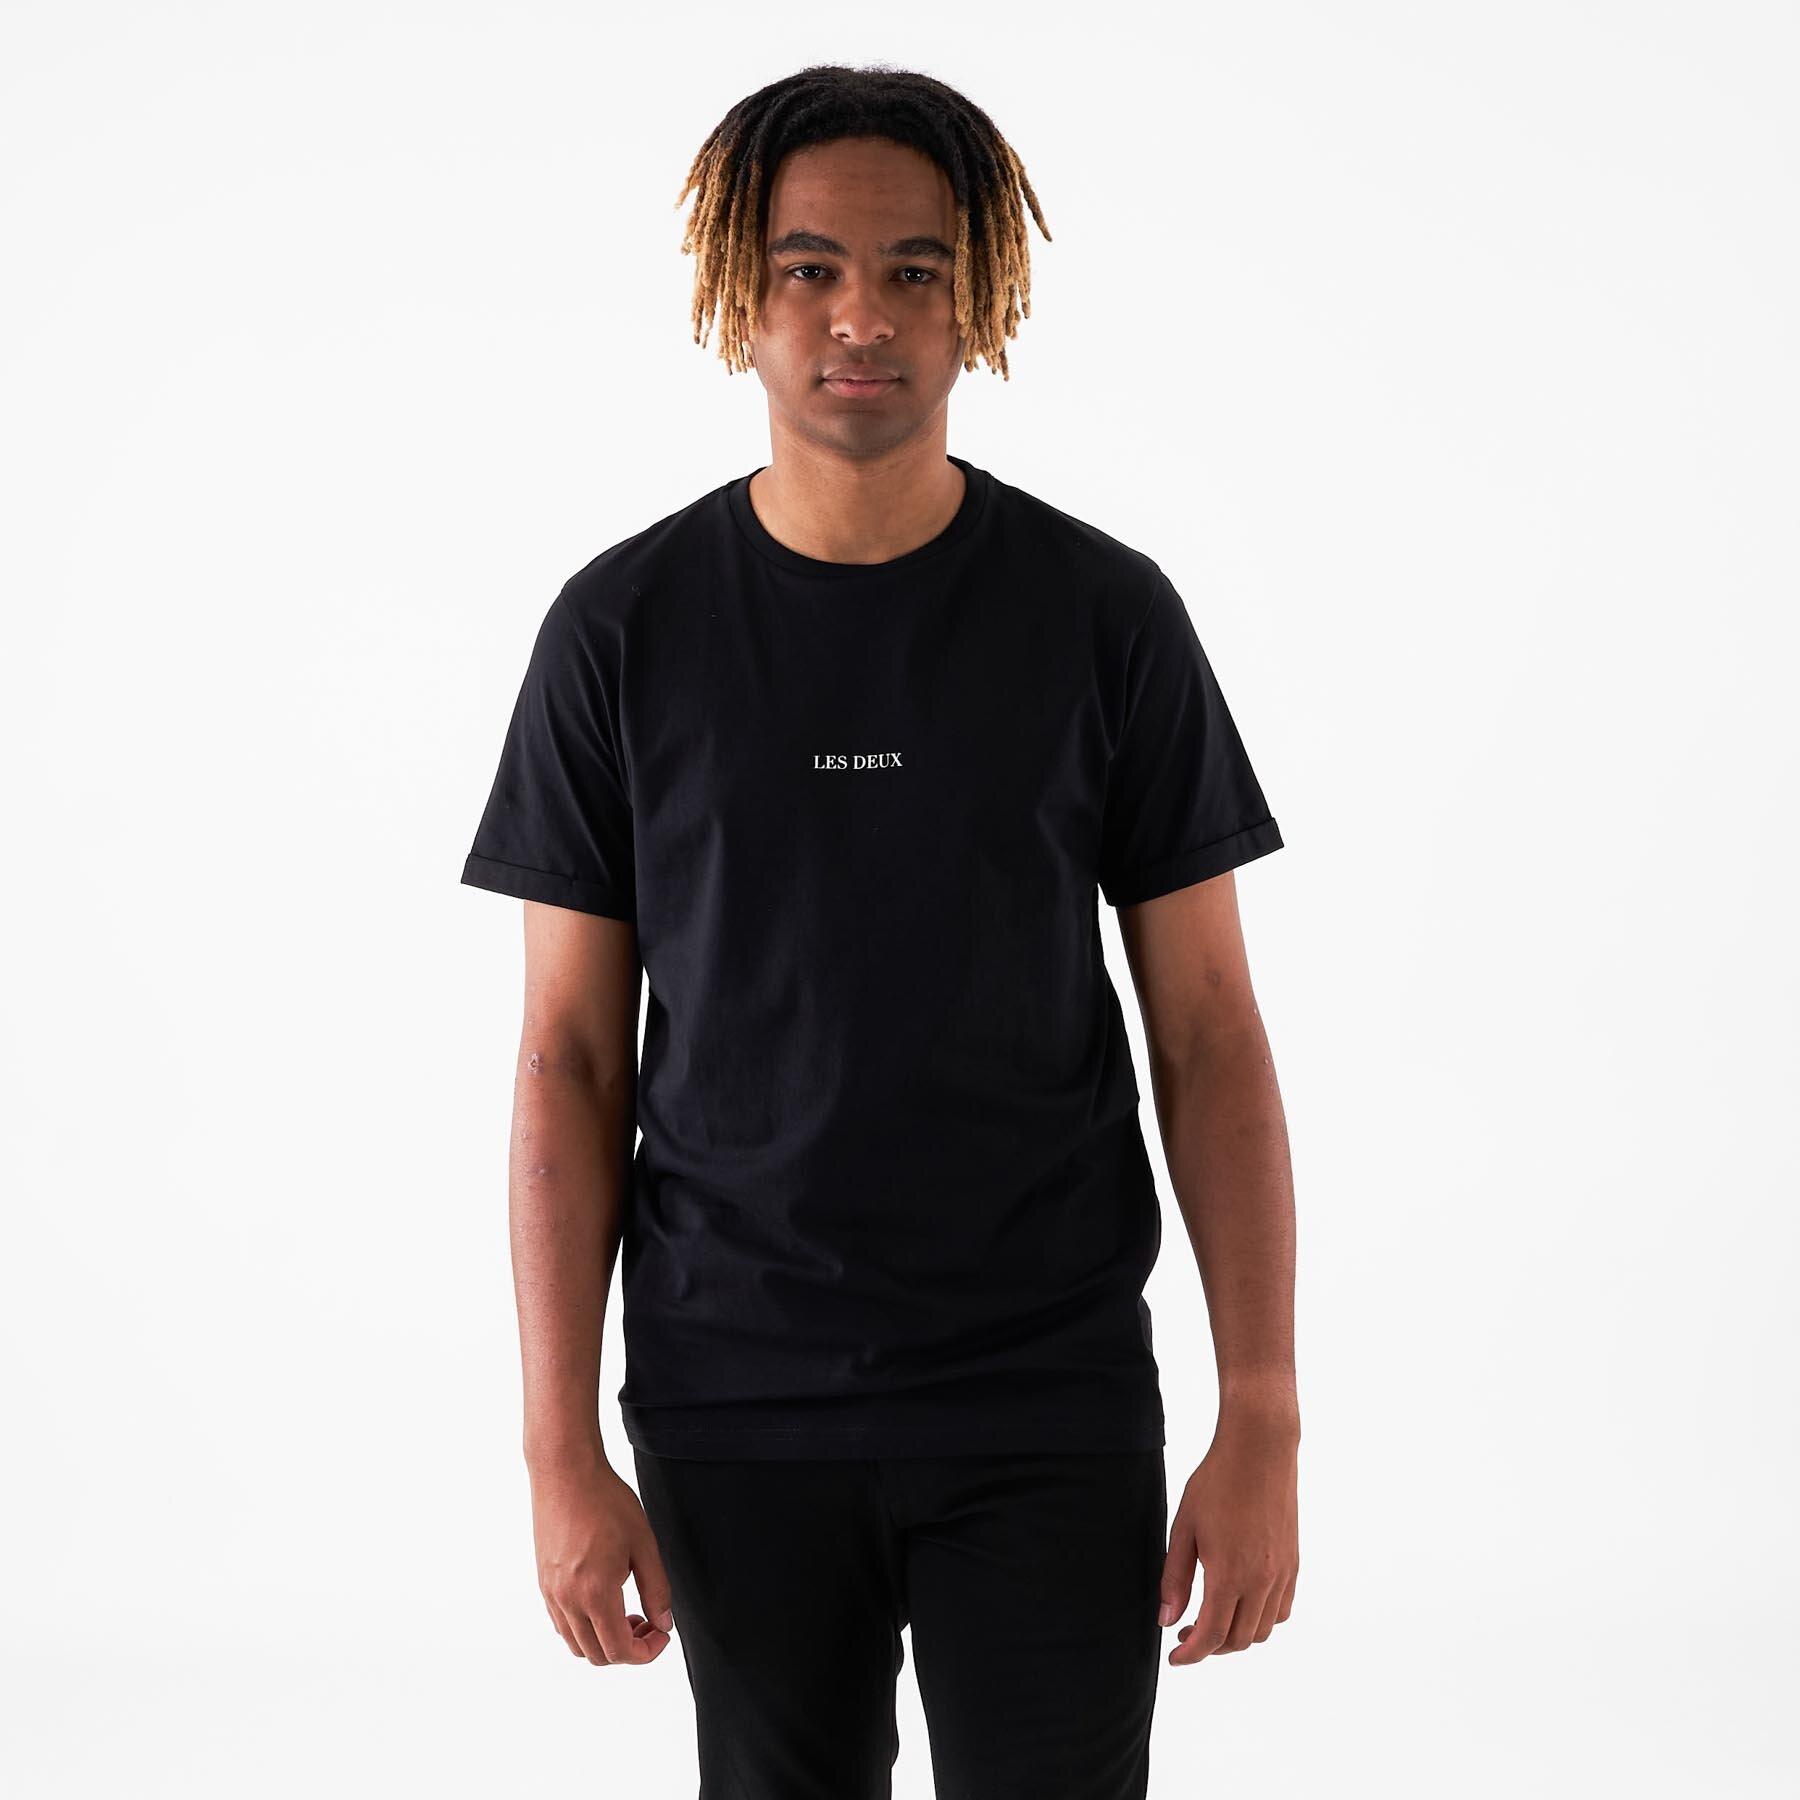 Les Deux - Lens T-Shirt - T-shirts til mænd - 100201-BLACK/WHITE - S